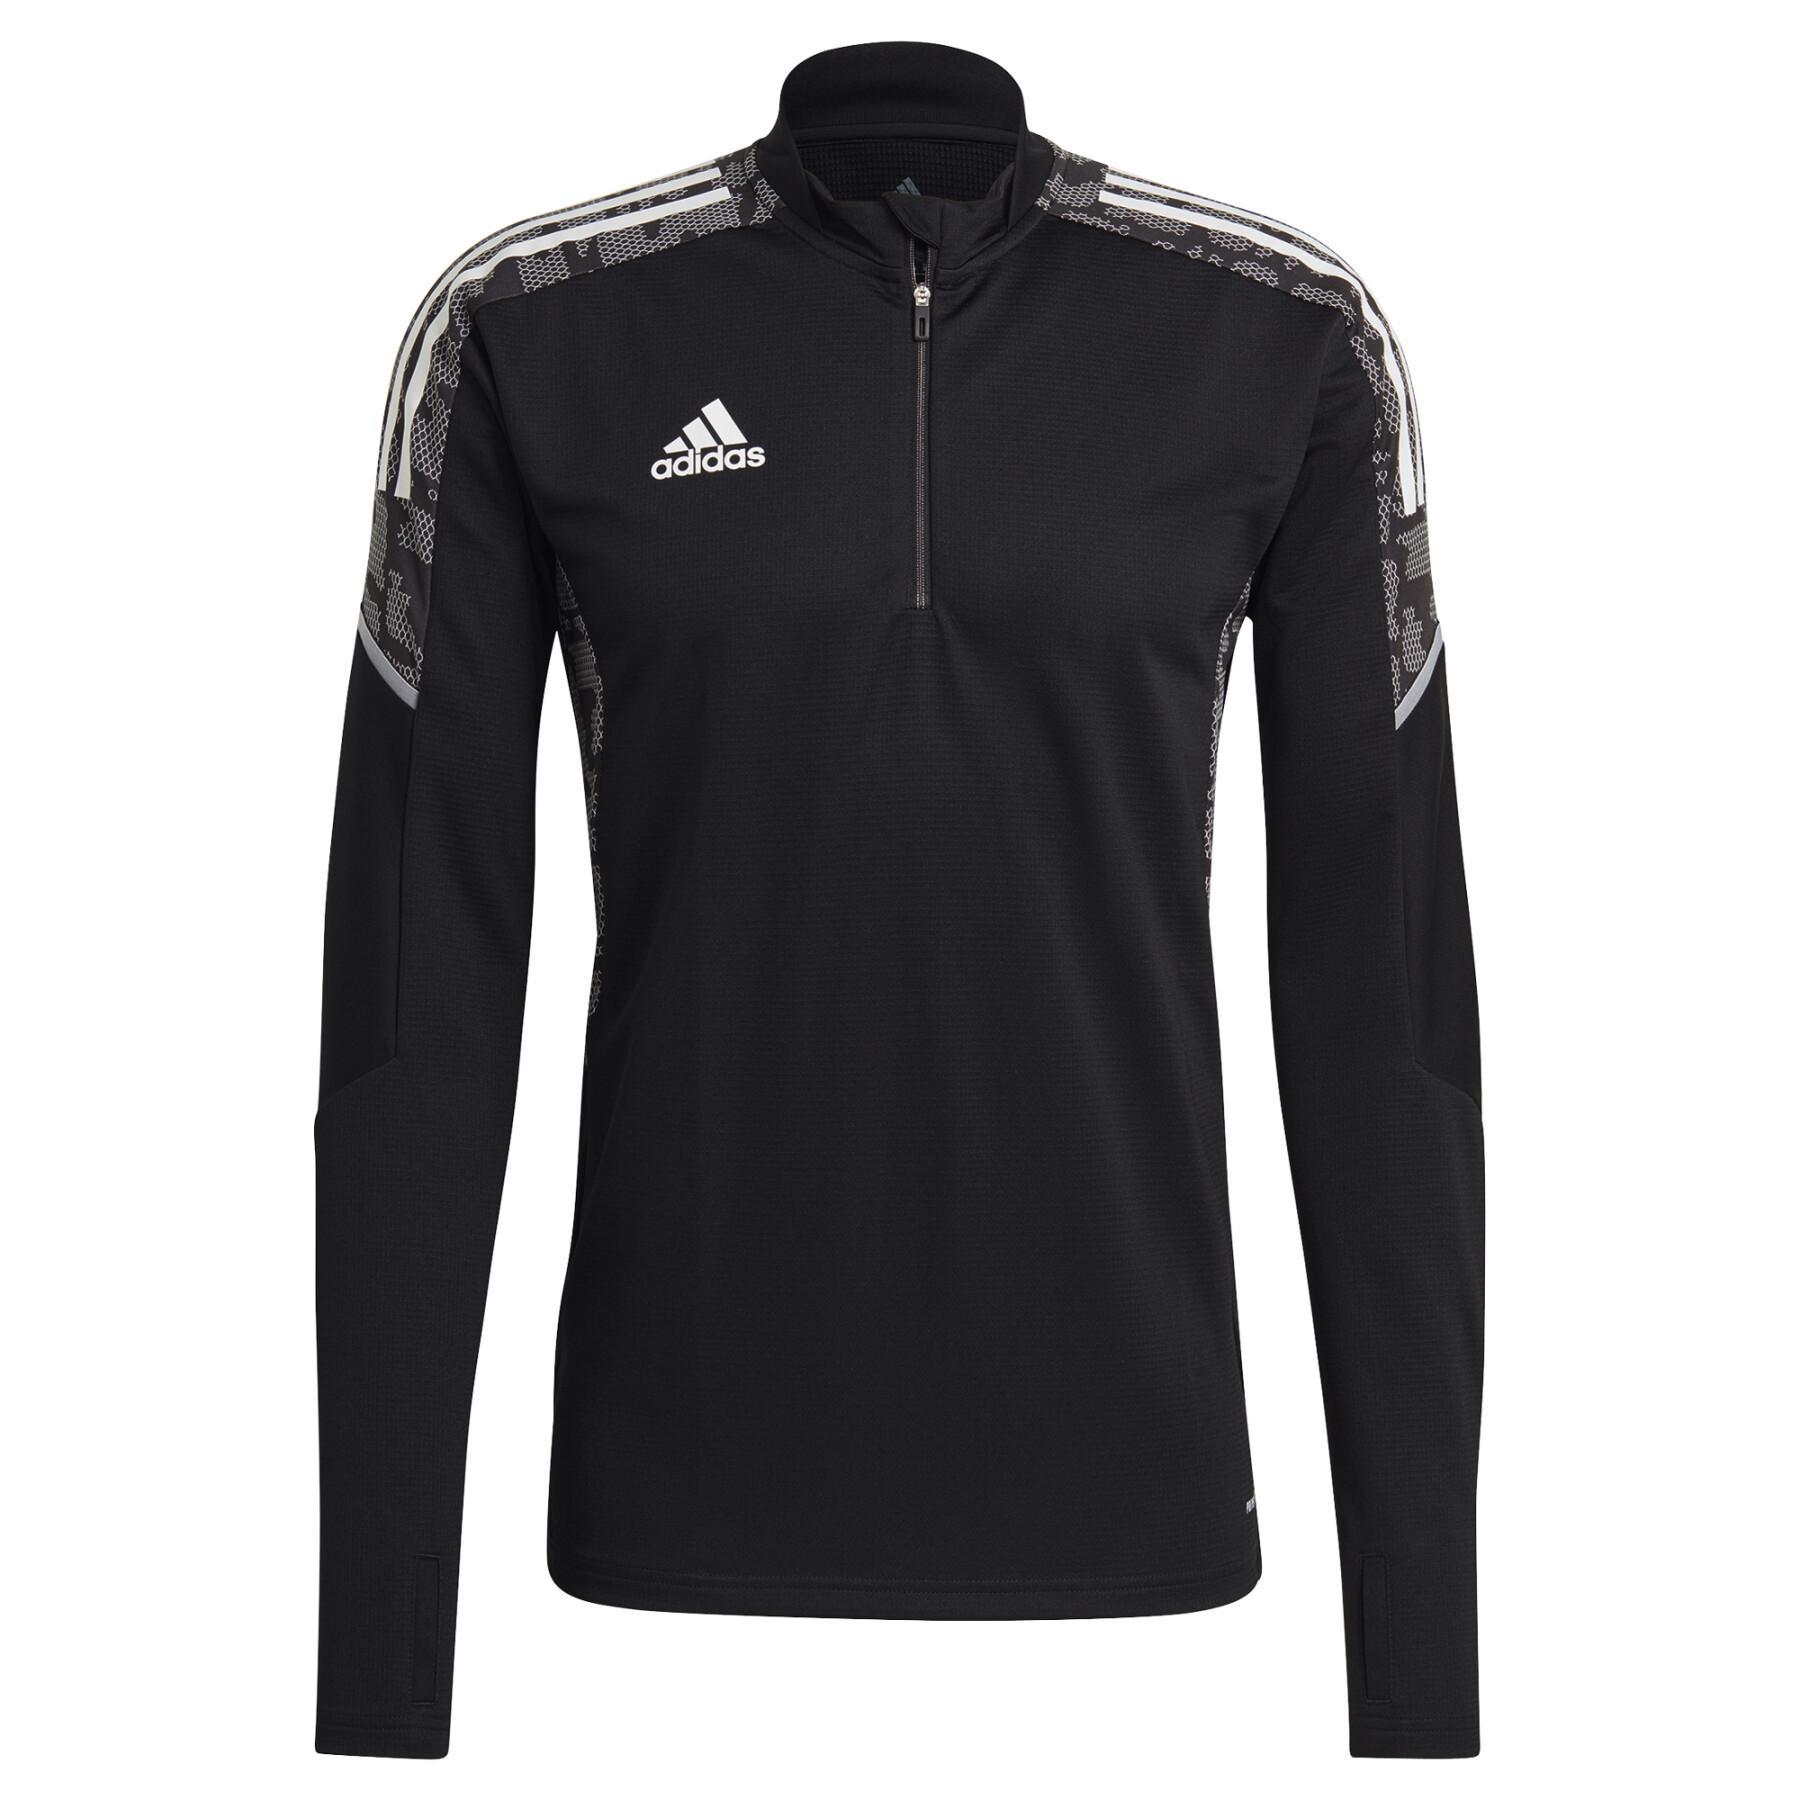 Training jacket adidas Condivo 21 Primeblue